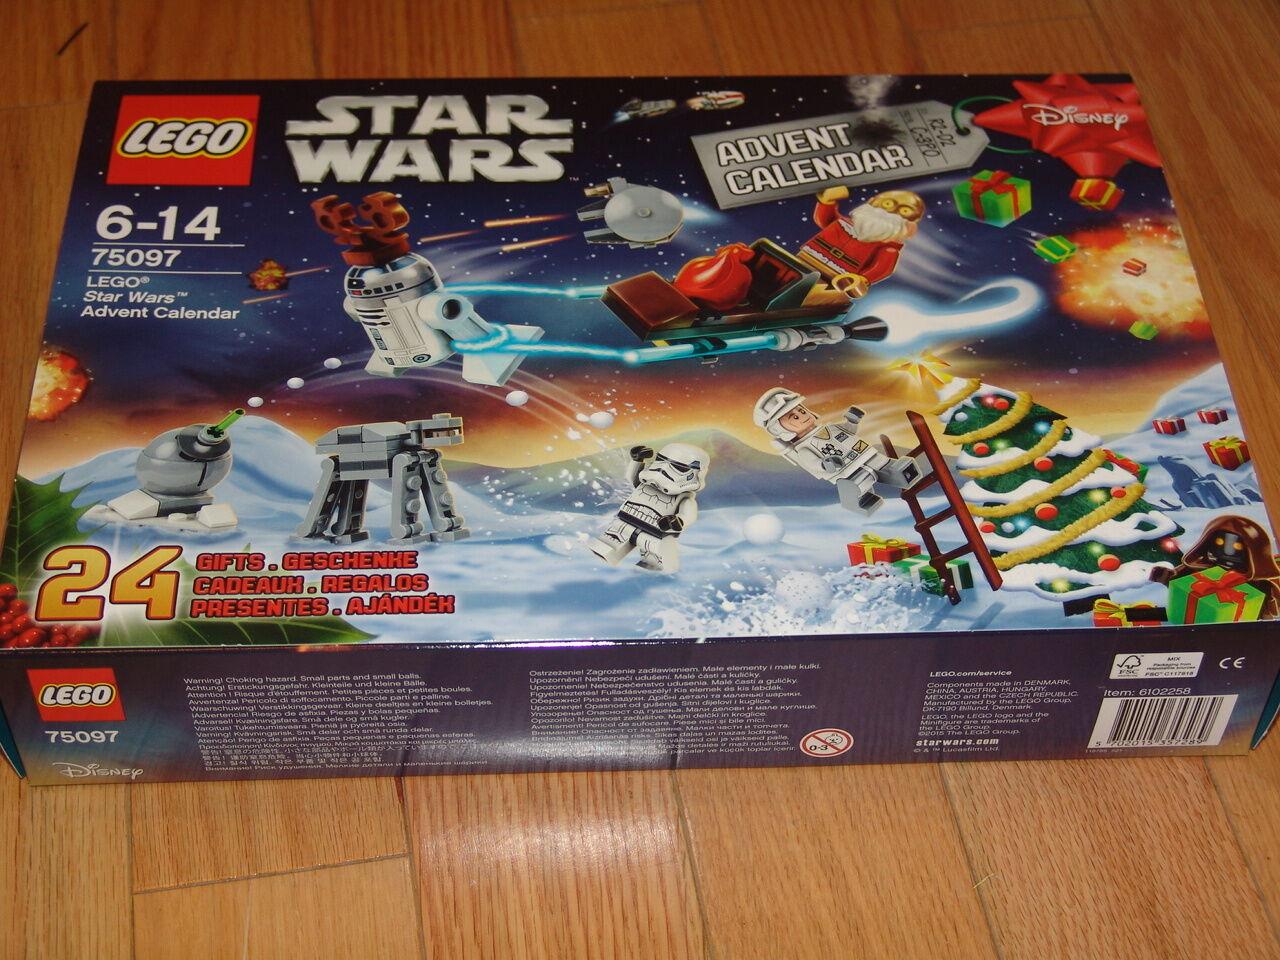 LEGO STARWARS 75097 ADVENT CALENDER 2015 BRAND NEW SEALED SEALED SEALED BOX 90fcef